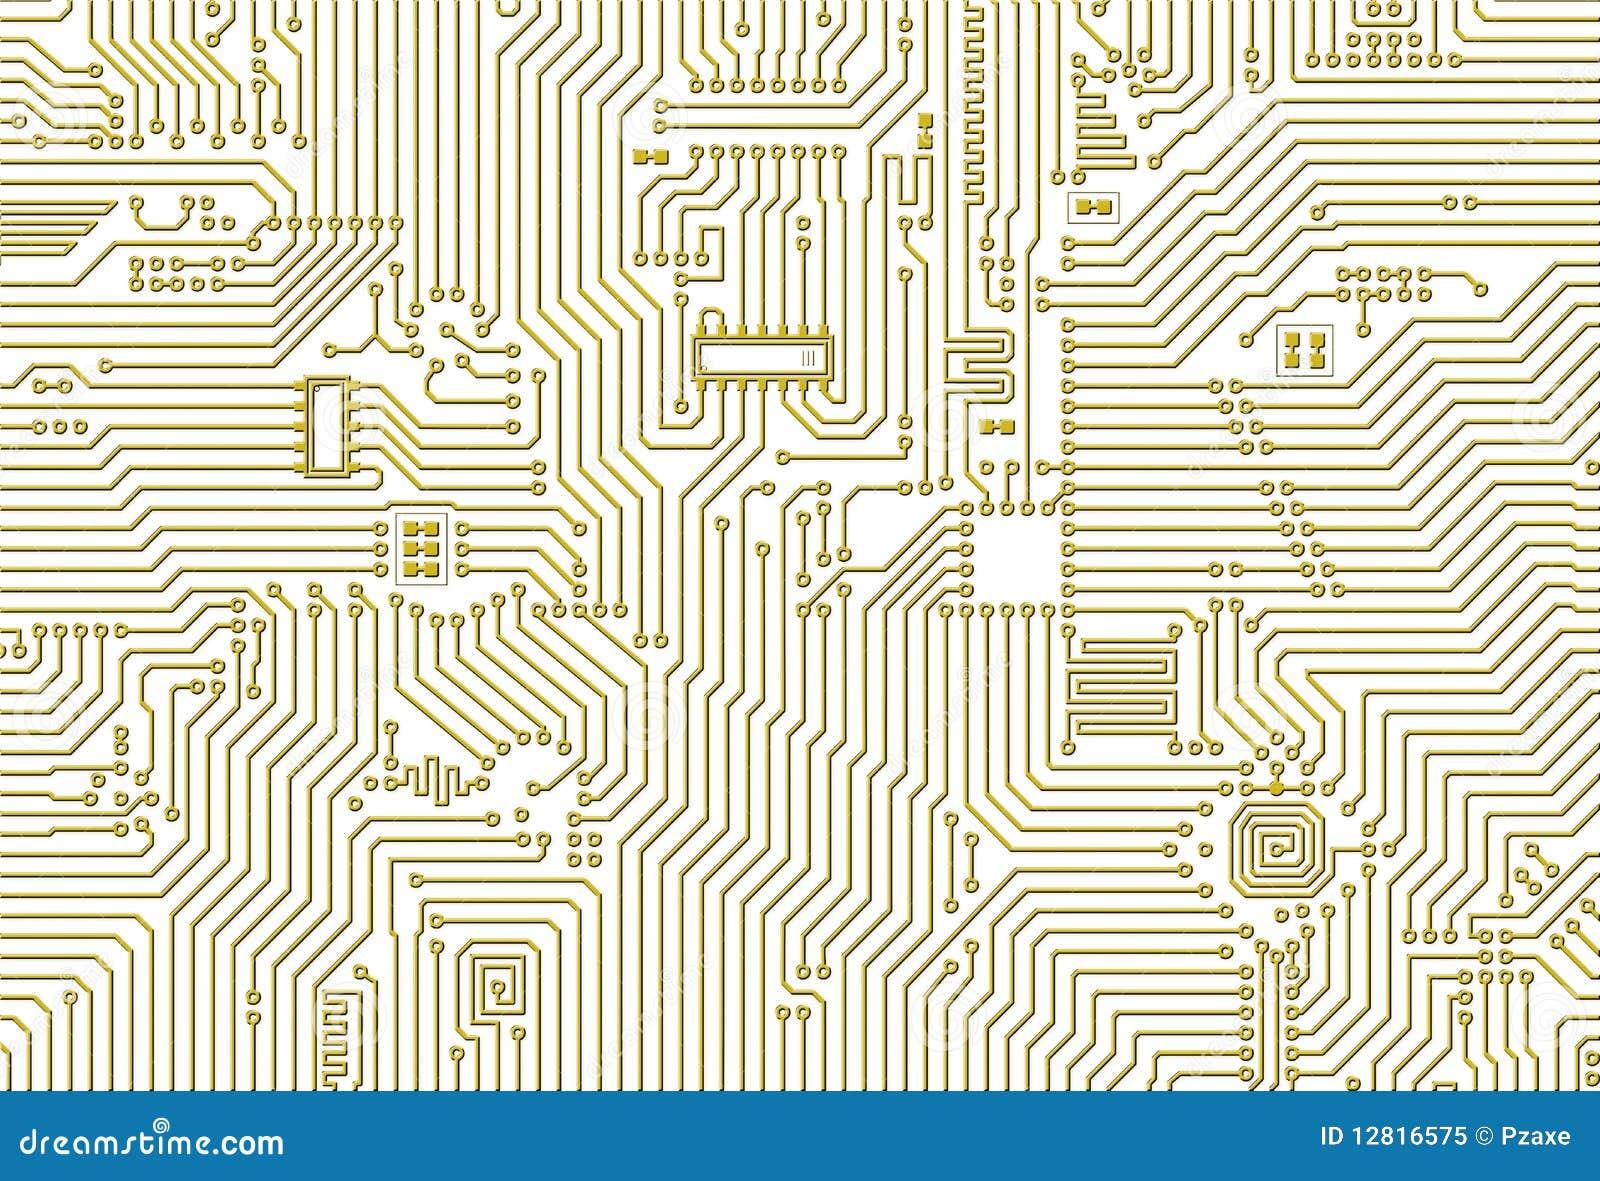 golden industrial circuit board pattern royalty free stock